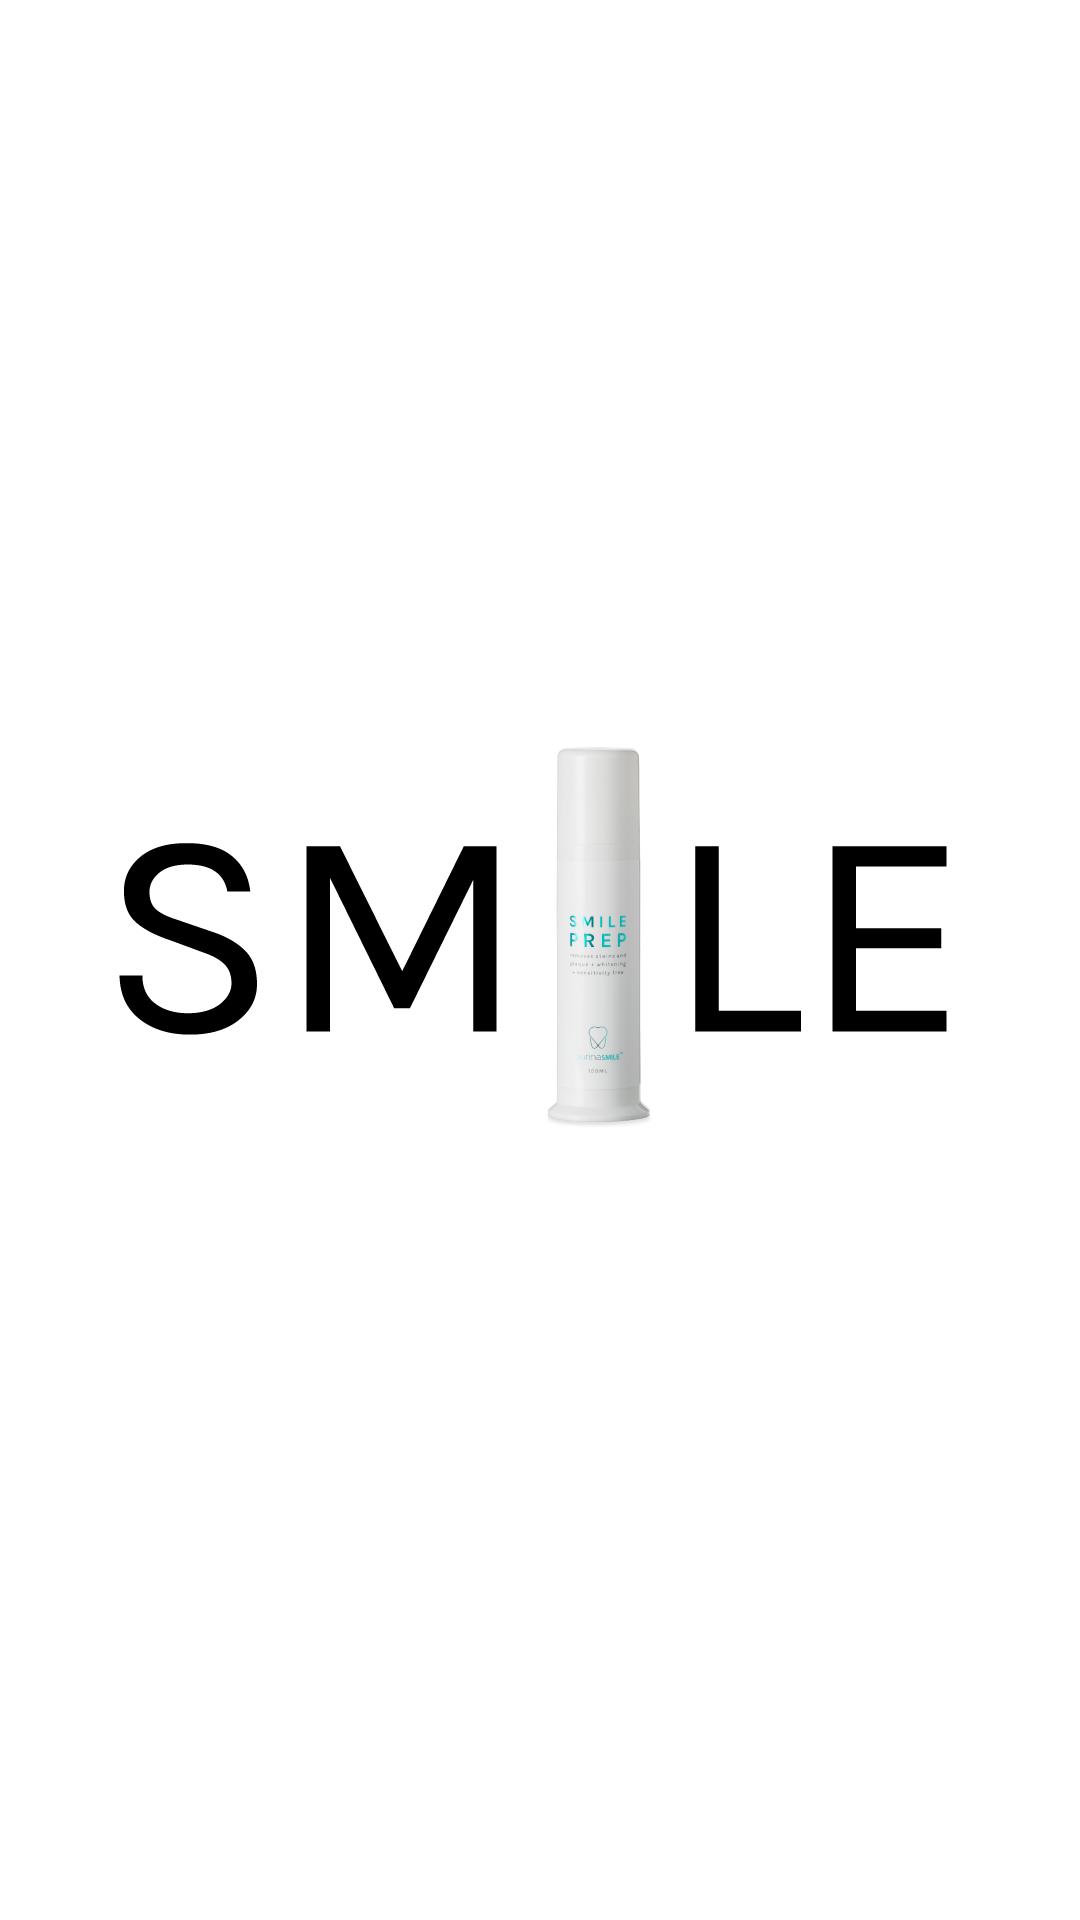 Smileprep_001.png